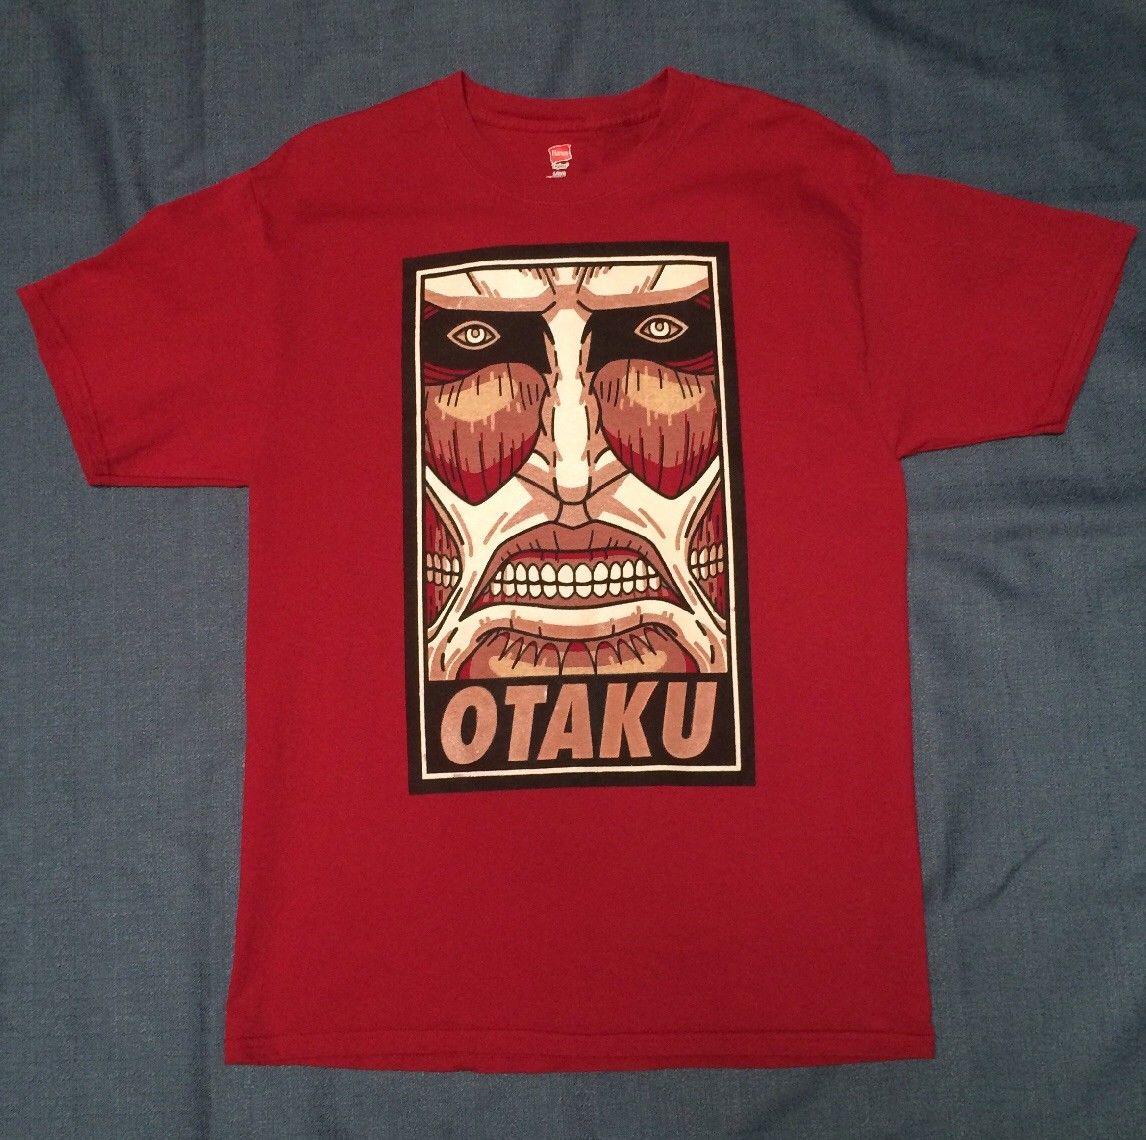 Attack on Titan Japanese Anime OTAKU T-Shirt Manga Death Note Graphic Novel Cartoon t shirt men Unisex New Fashion tshirt